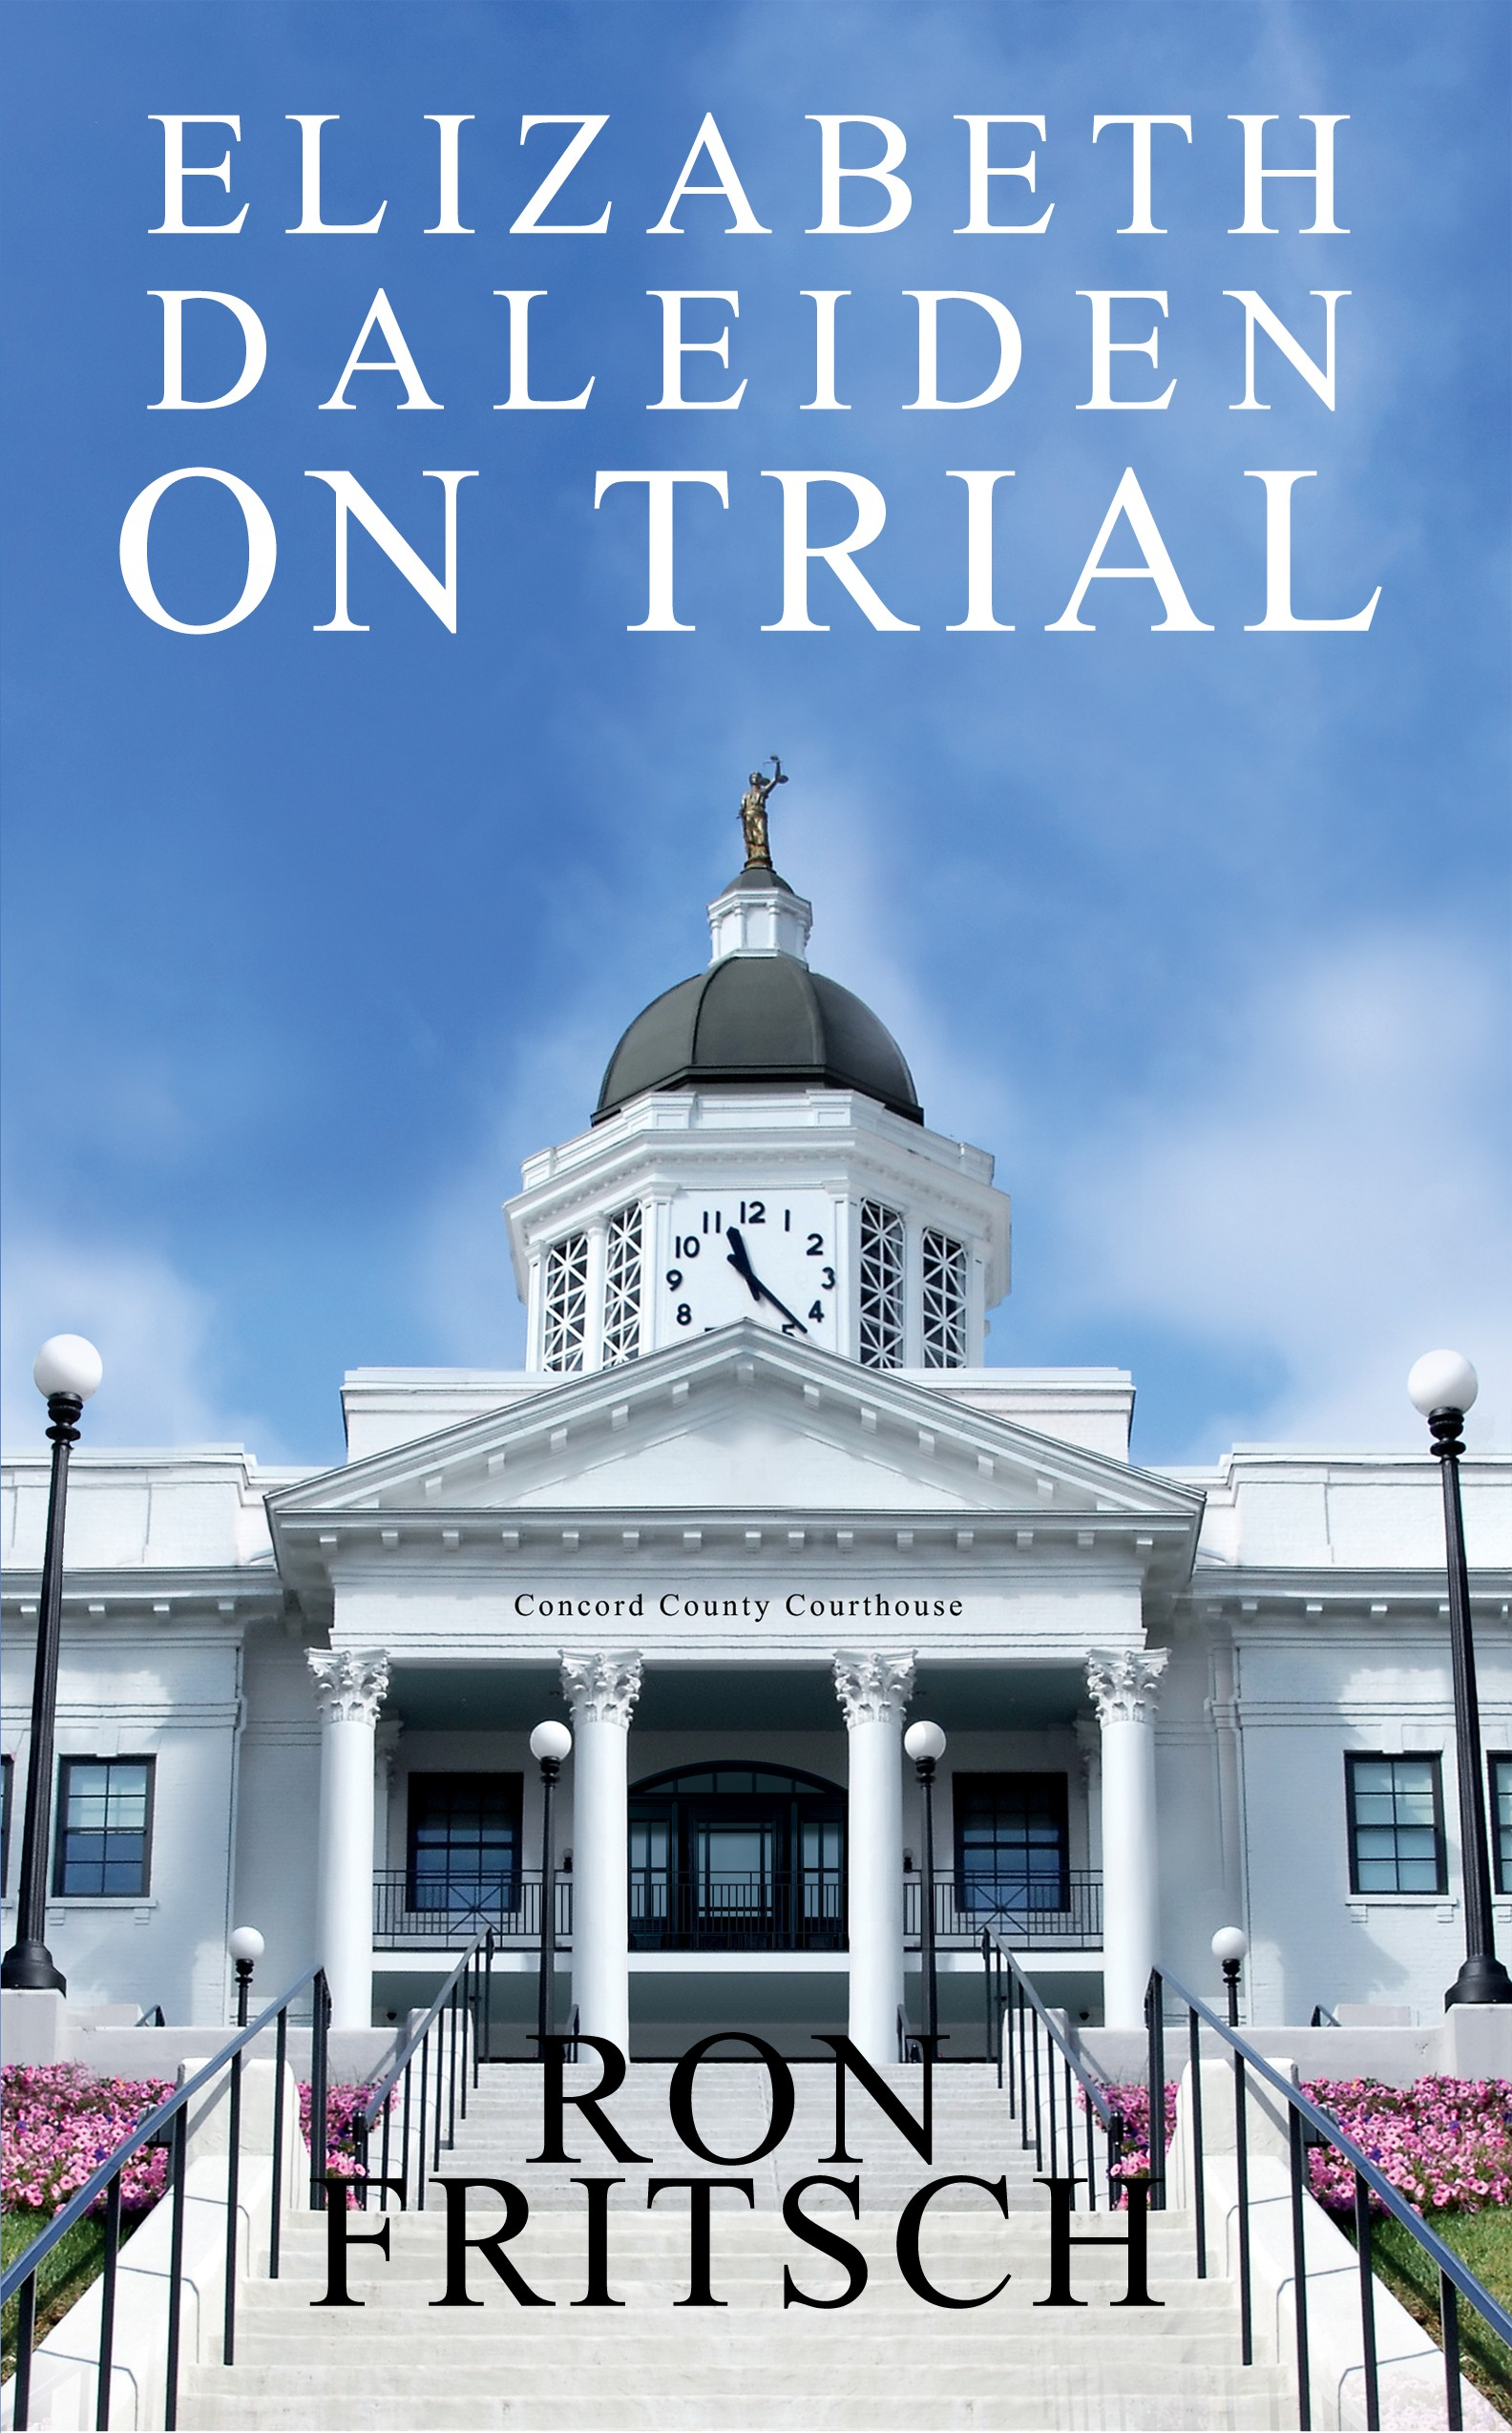 Edit a photo for a cover for my novel, Elizabeth Daleiden on Trial